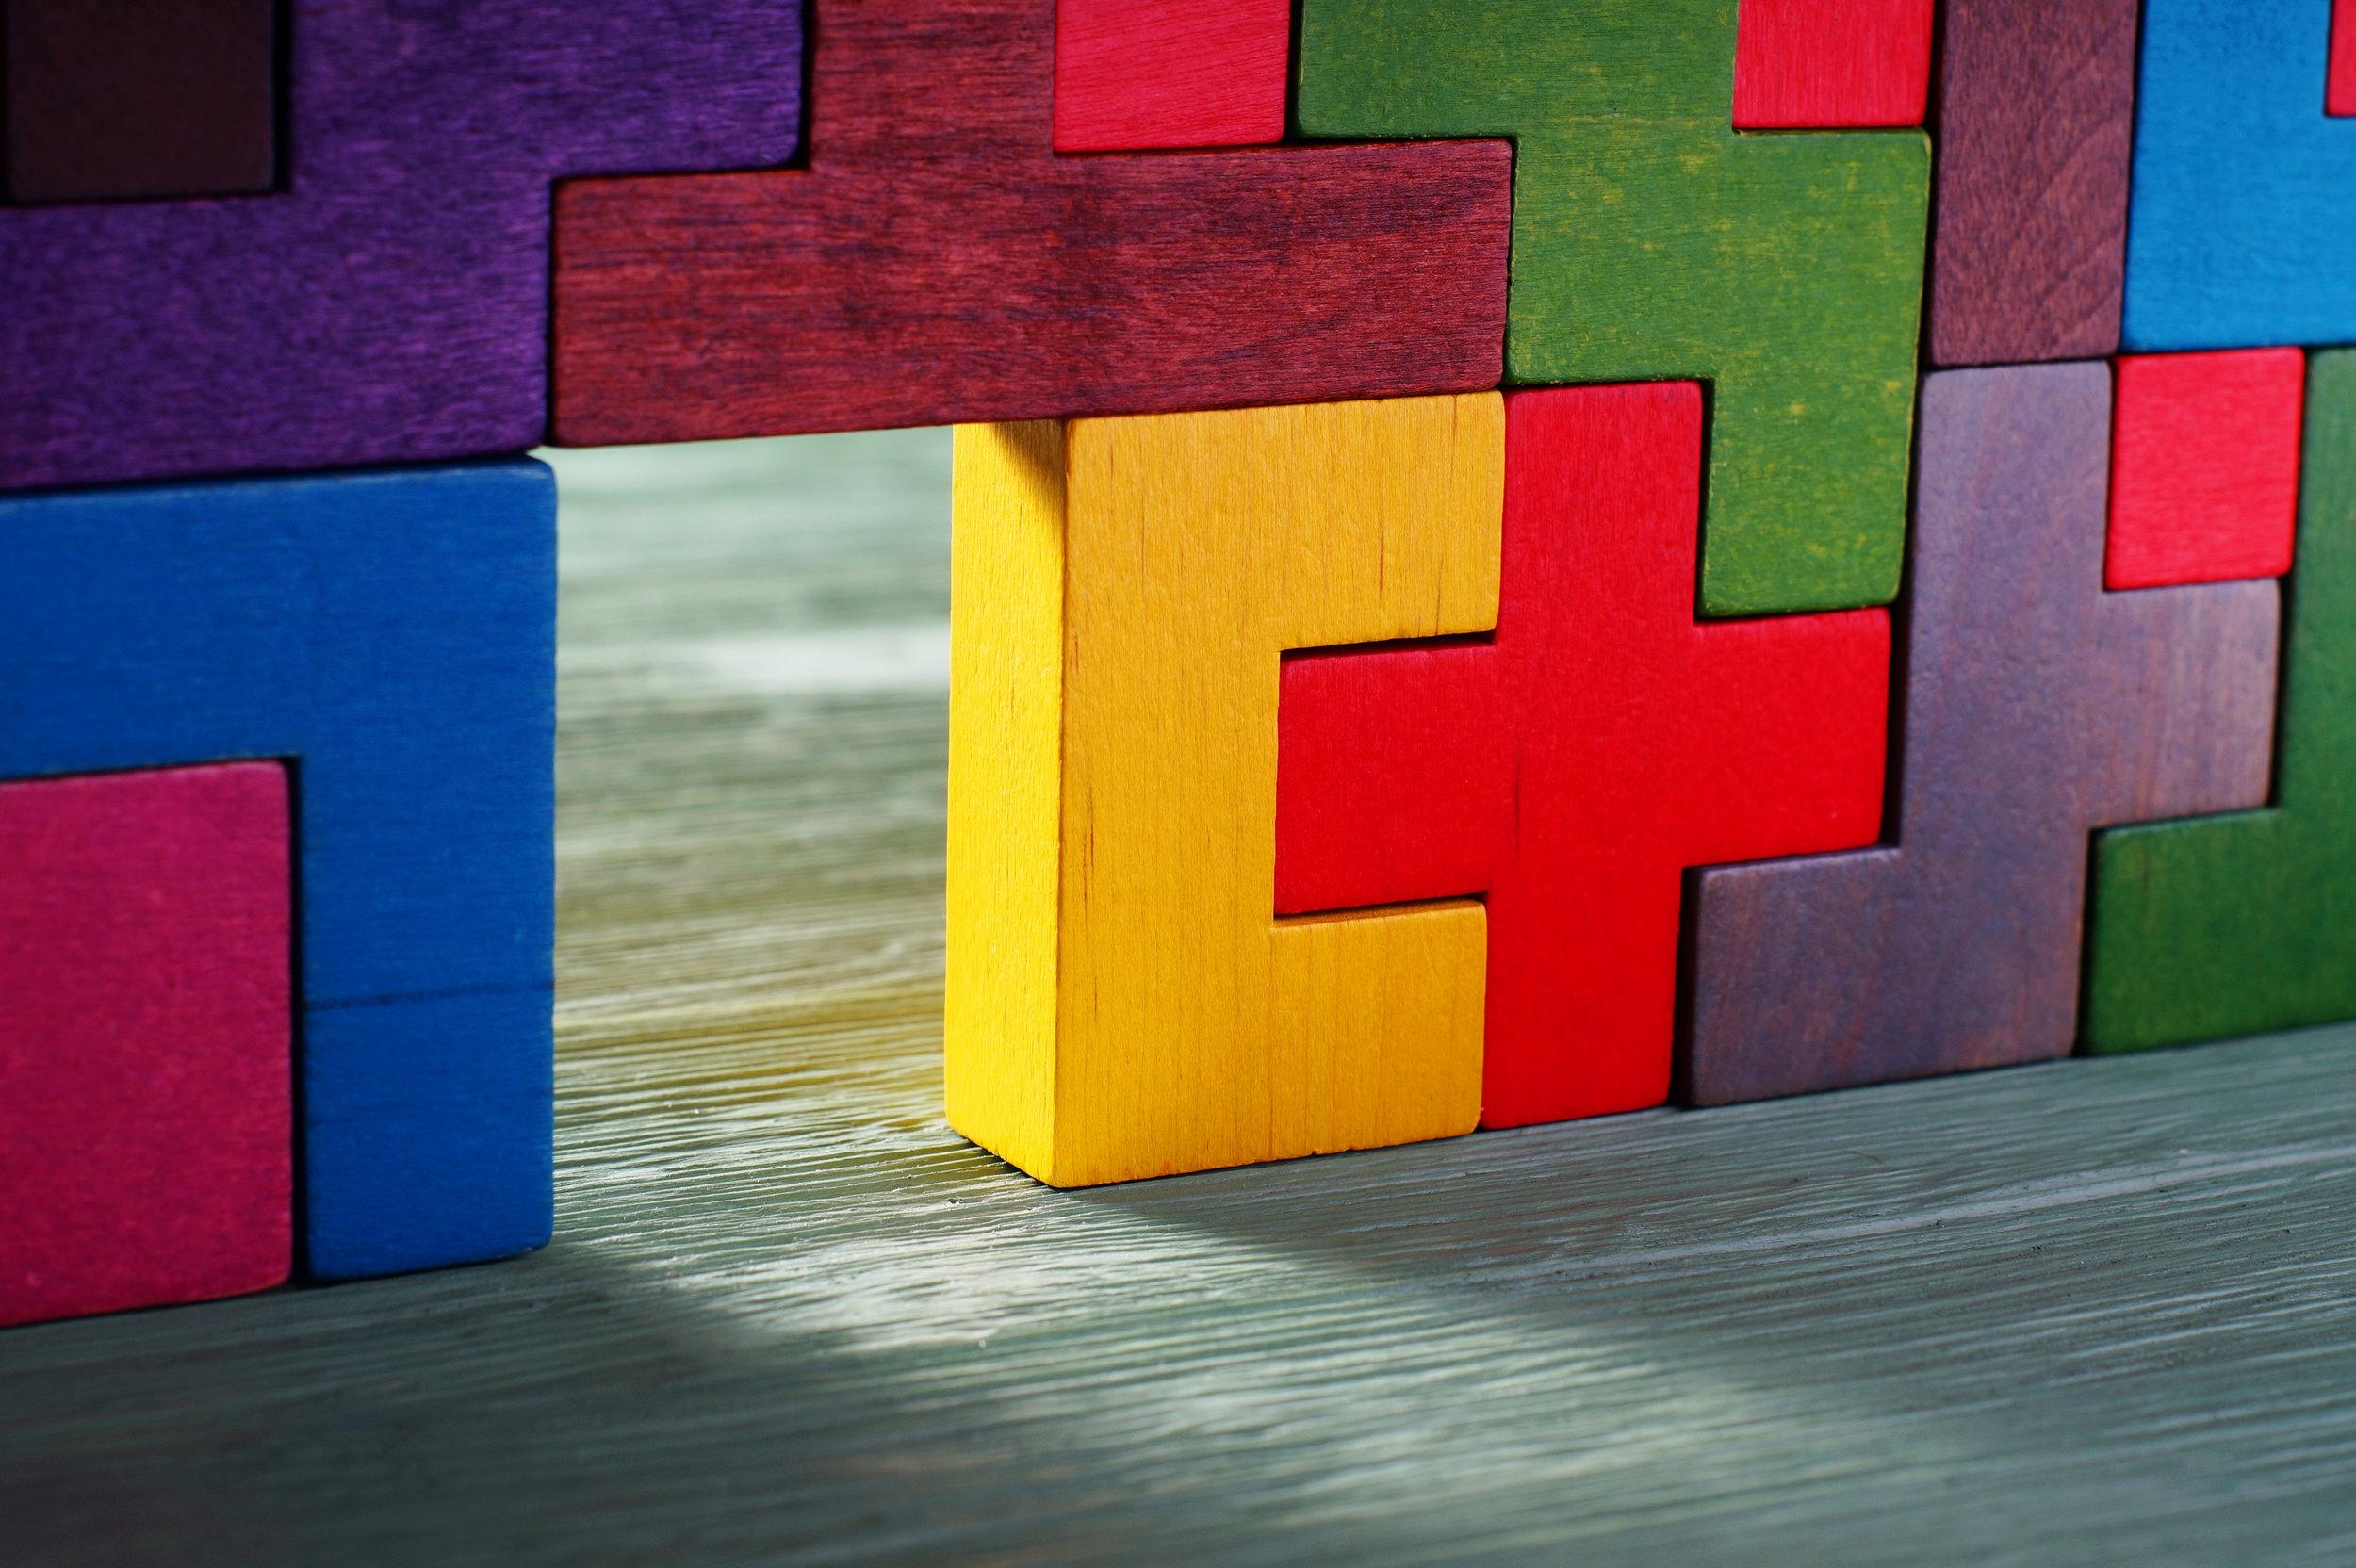 colored blocks_shutterstock_510712174.jpg